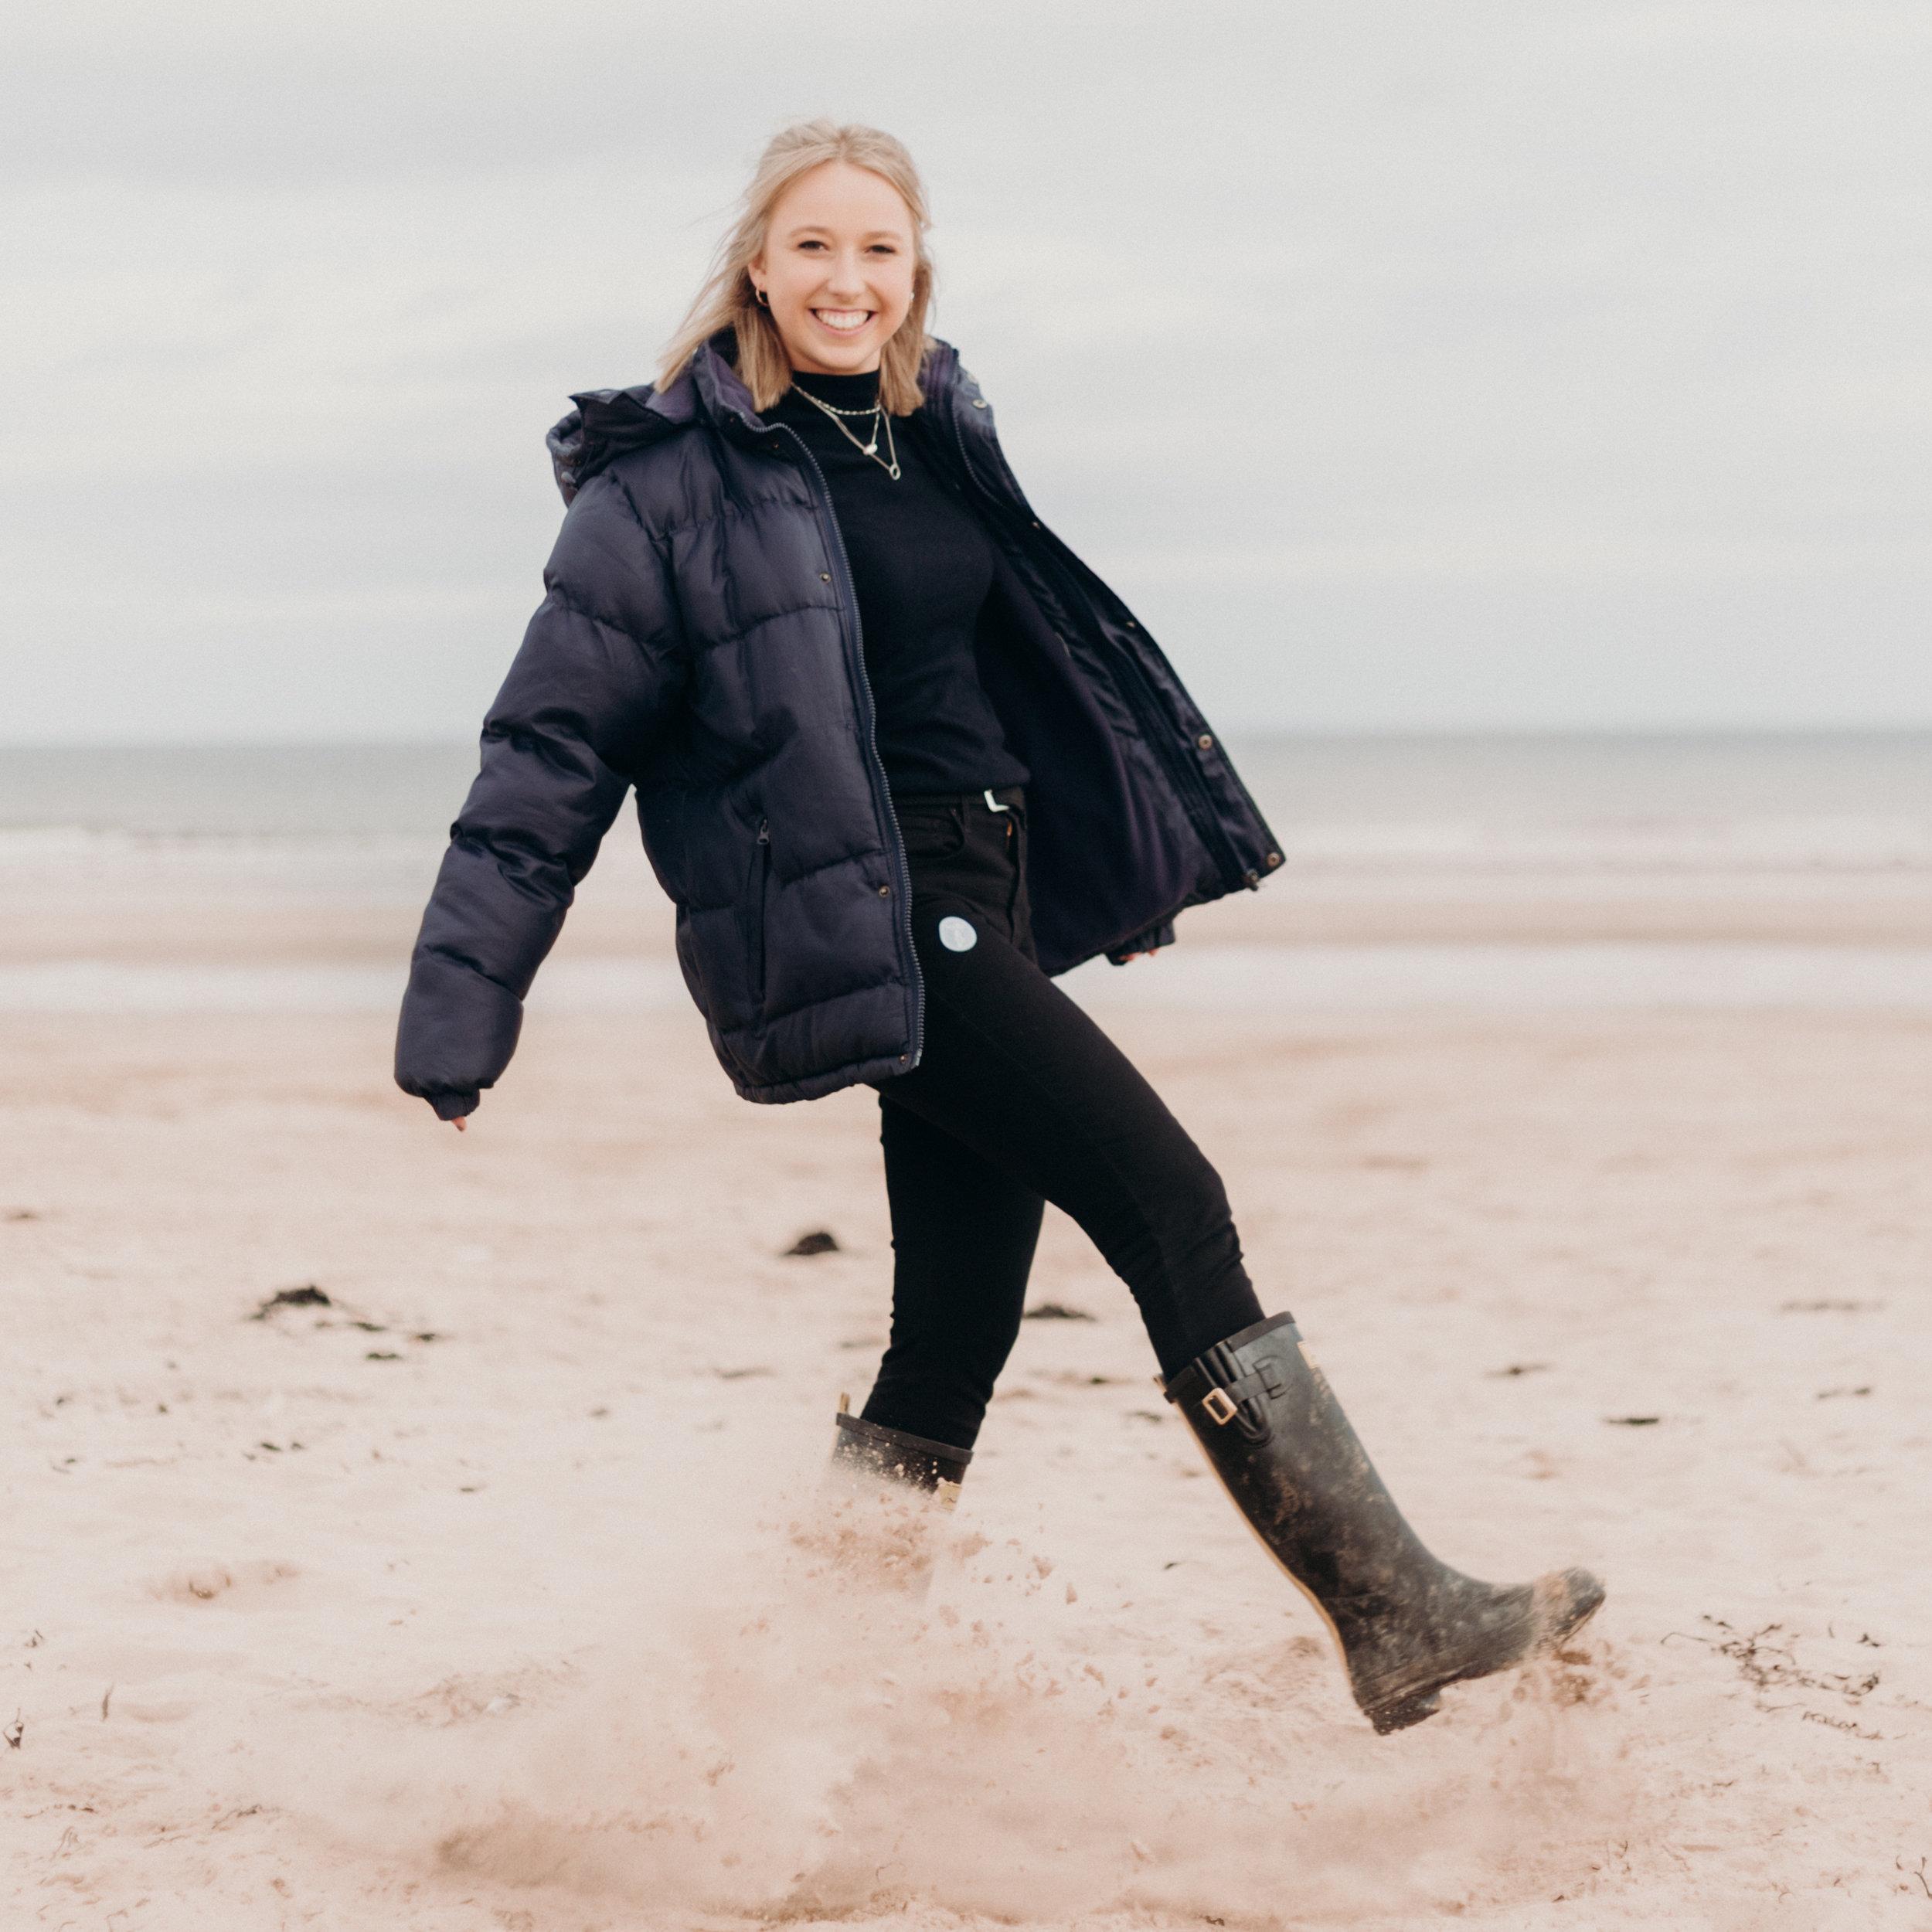 Rachel Pearson - Marketing